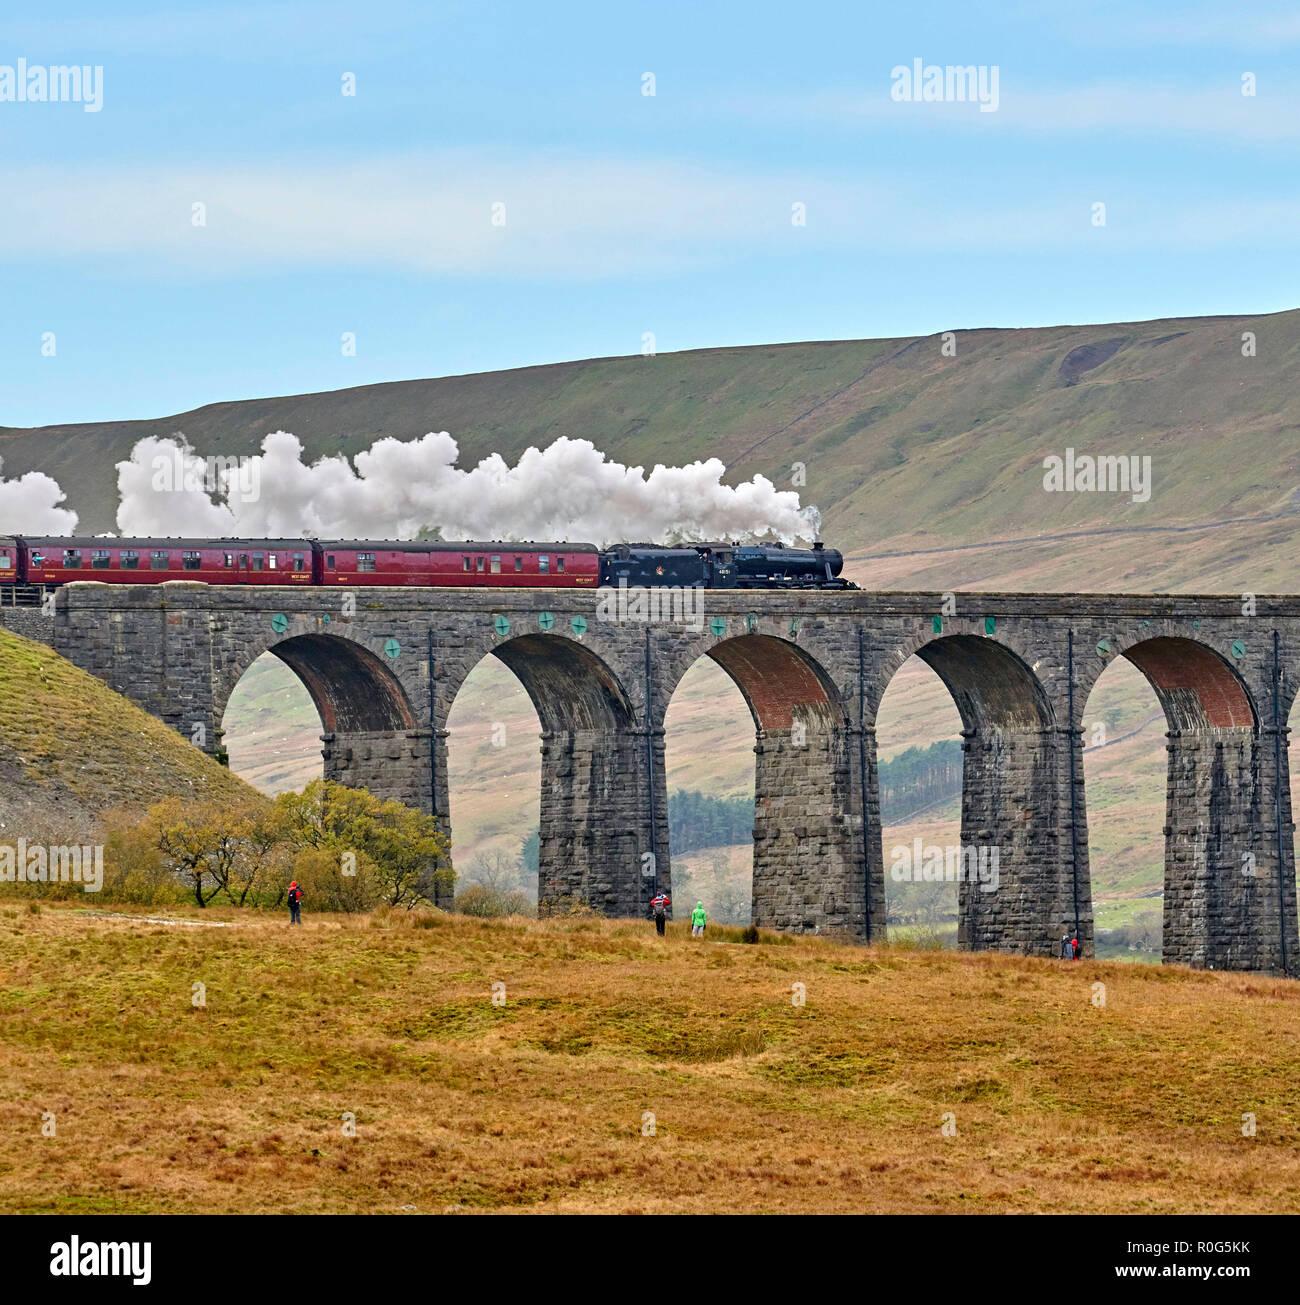 Erhaltene Dampf bespannt am Bahnhof Ribblehead Viadukt über die Settle and Carlisle Railway Line, Yorkshire Dales National Park, Northern England, Großbritannien Stockfoto